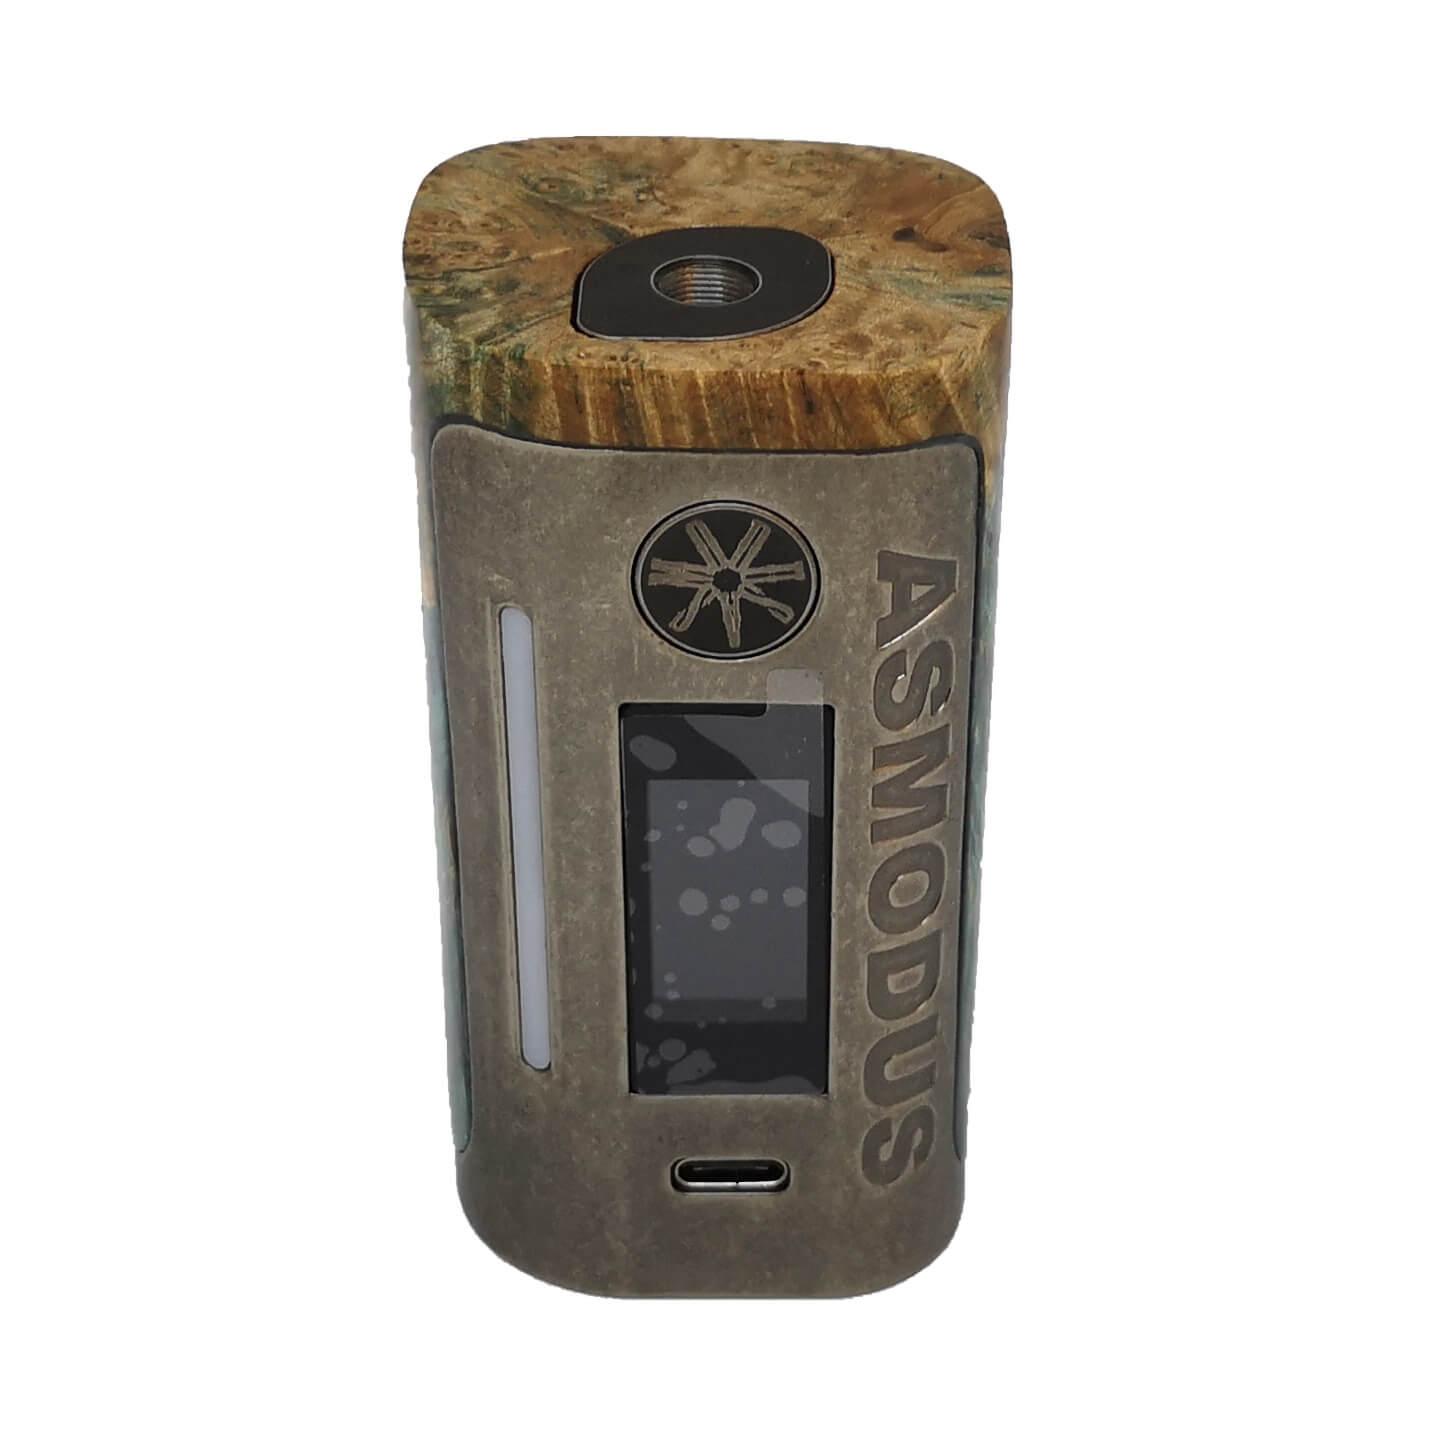 Asmodus Lustro Mod sabiliesiertes Holz Mod Akkutrager regelbar 80W 05 01